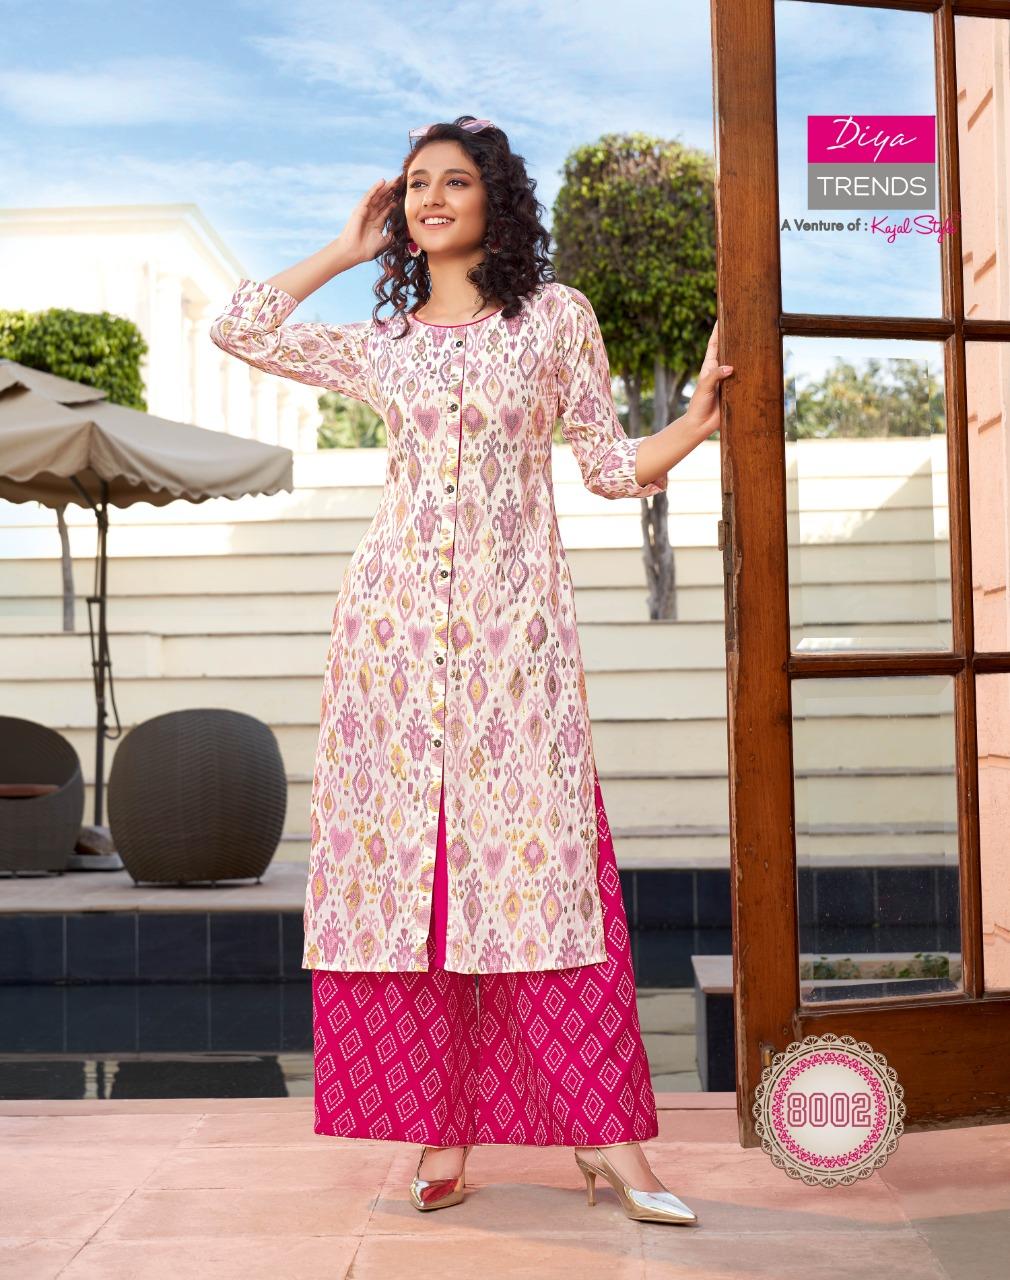 Diya Trends Bibas Vol 8 by Kajal Style Kurti with Palazzo Pant Wholesale Catalog 14 Pcs 10 - Diya Trends Biba's Vol 8 by Kajal Style Kurti with Palazzo Pant Wholesale Catalog 14 Pcs